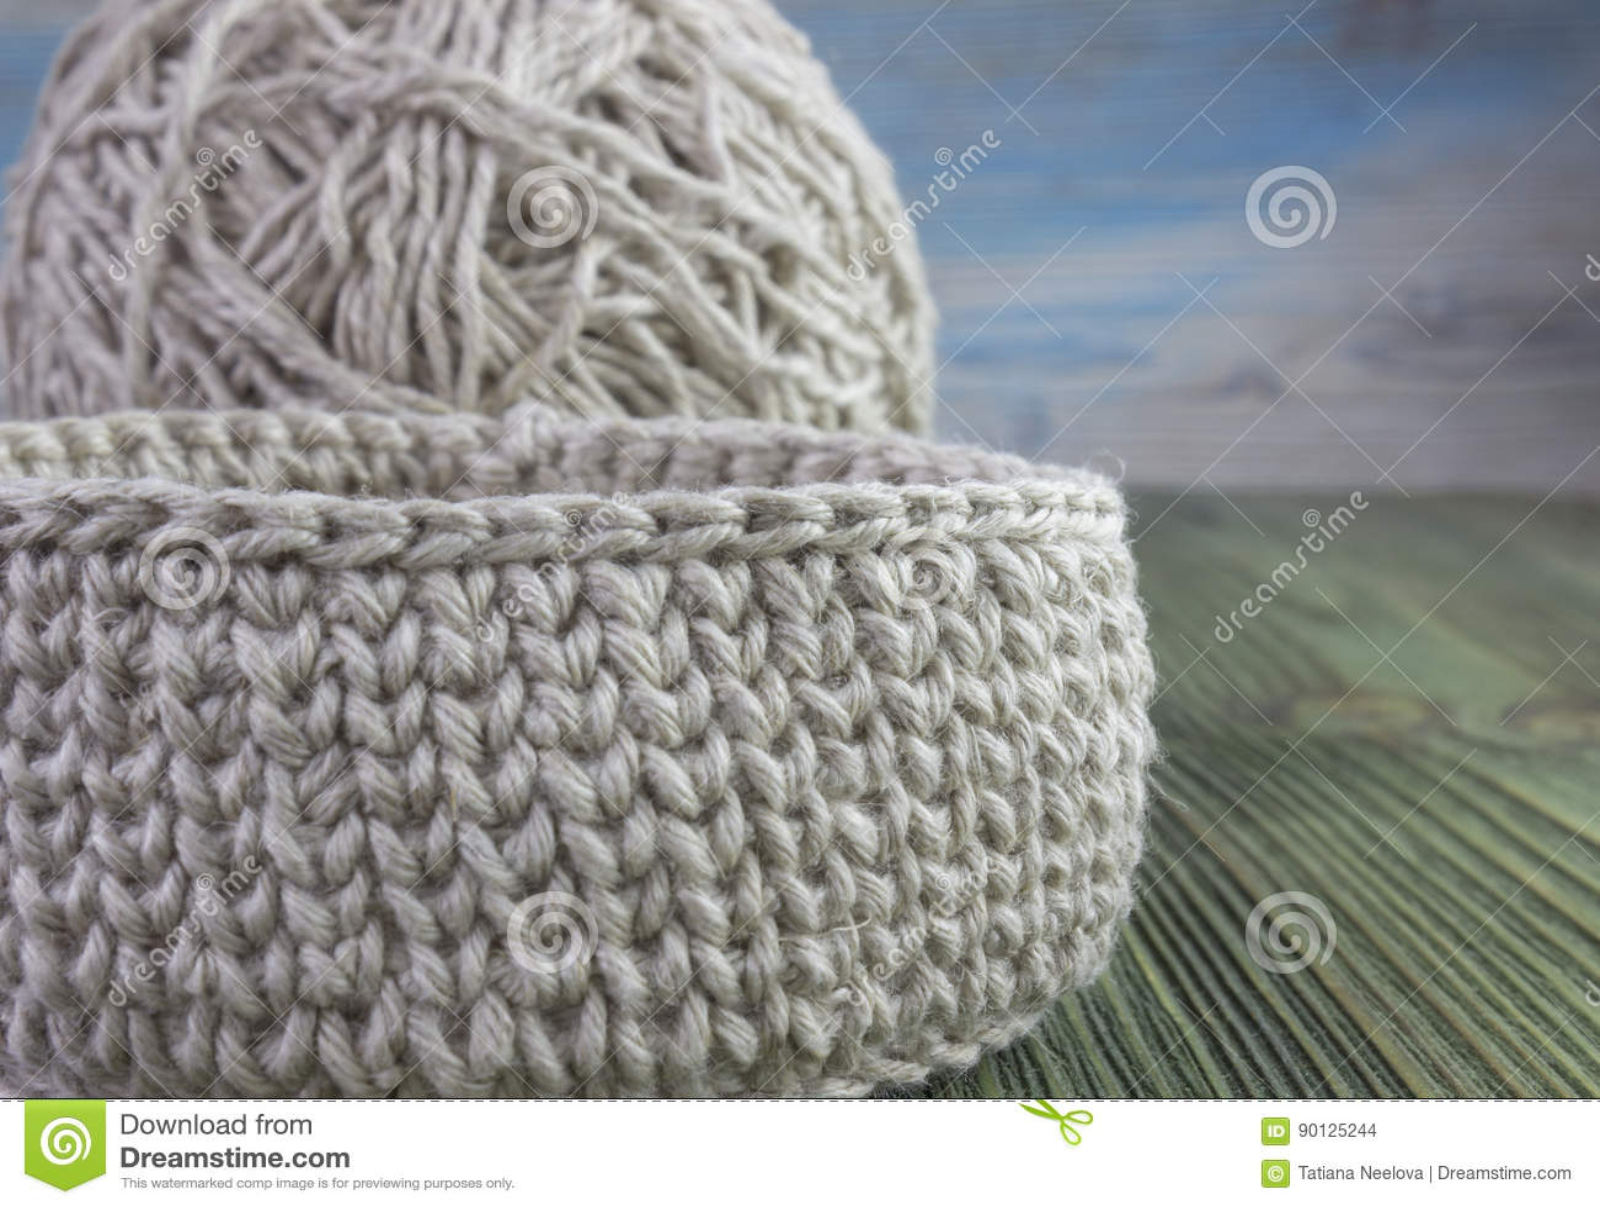 Linen Rustic Crochet Box Yarn Ball And Crochet Hook Natural